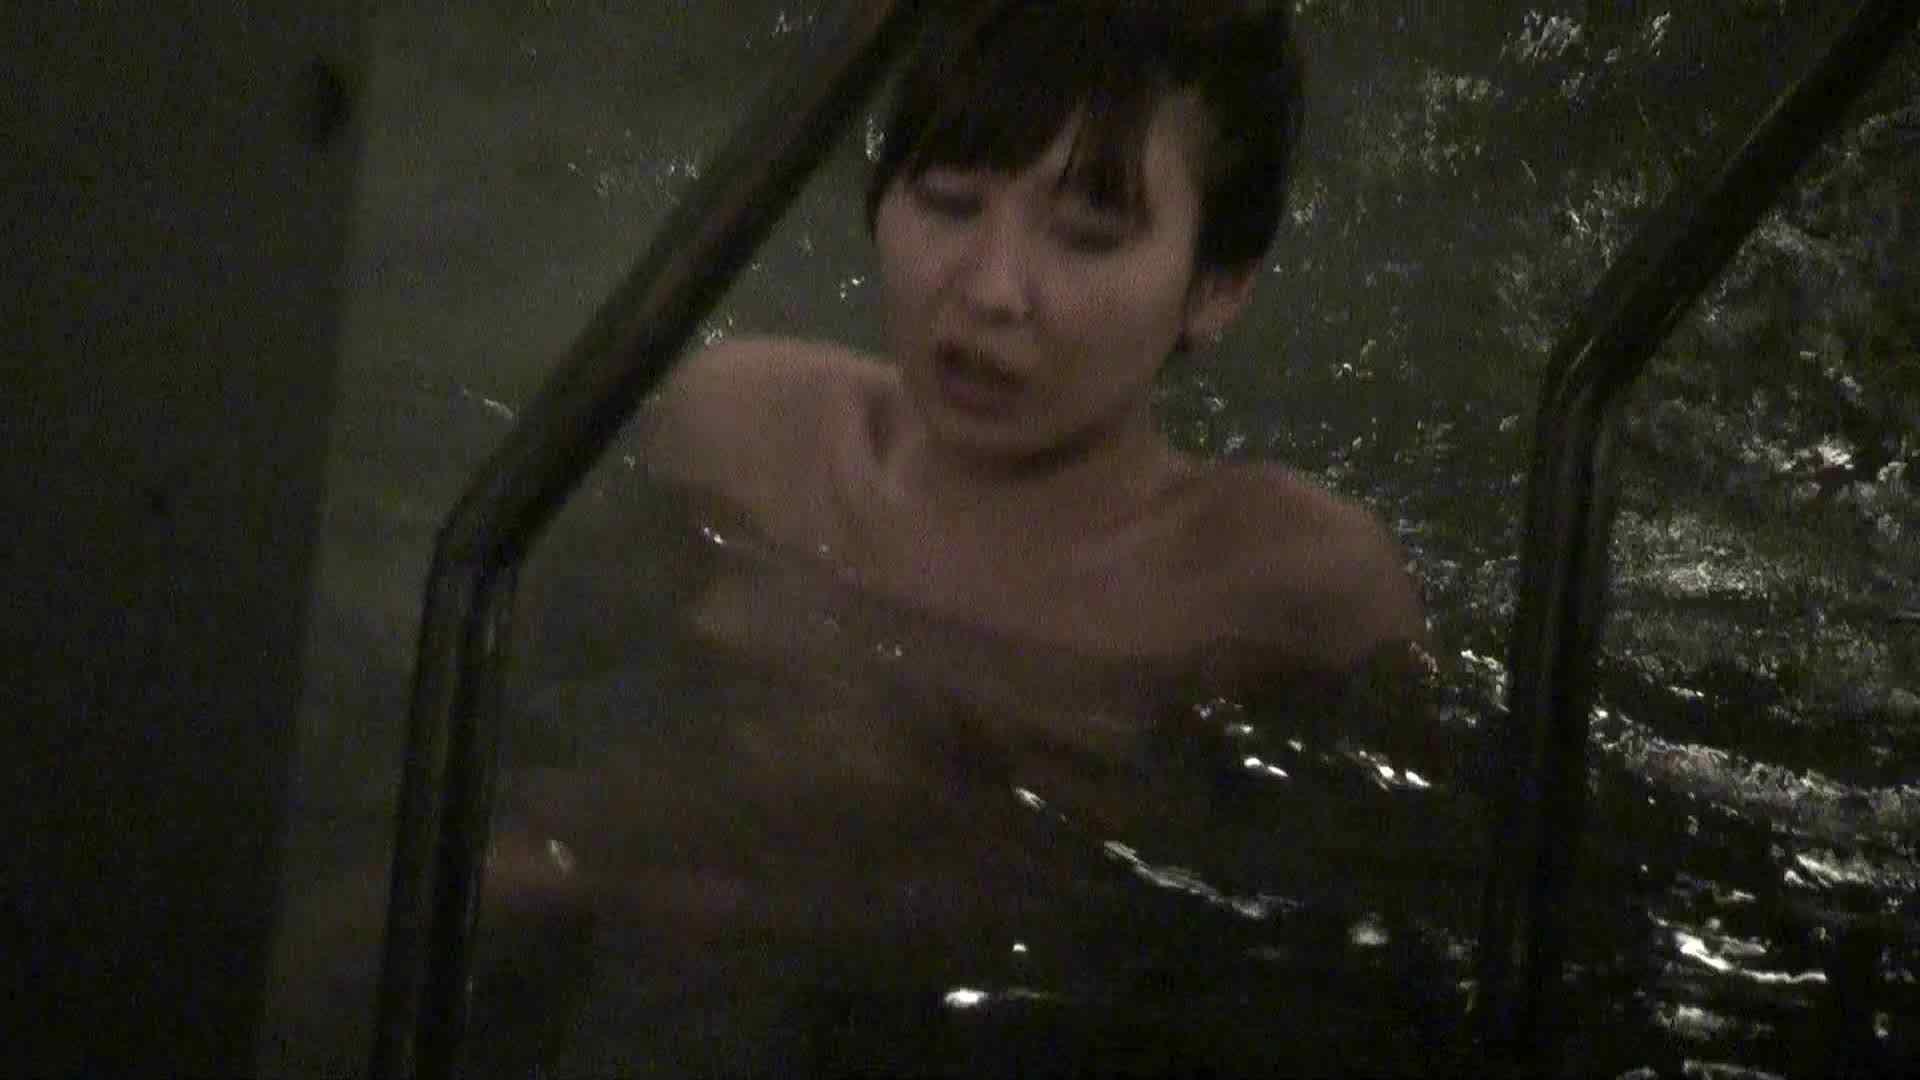 Aquaな露天風呂Vol.410 エッチな盗撮 AV無料動画キャプチャ 76pic 34